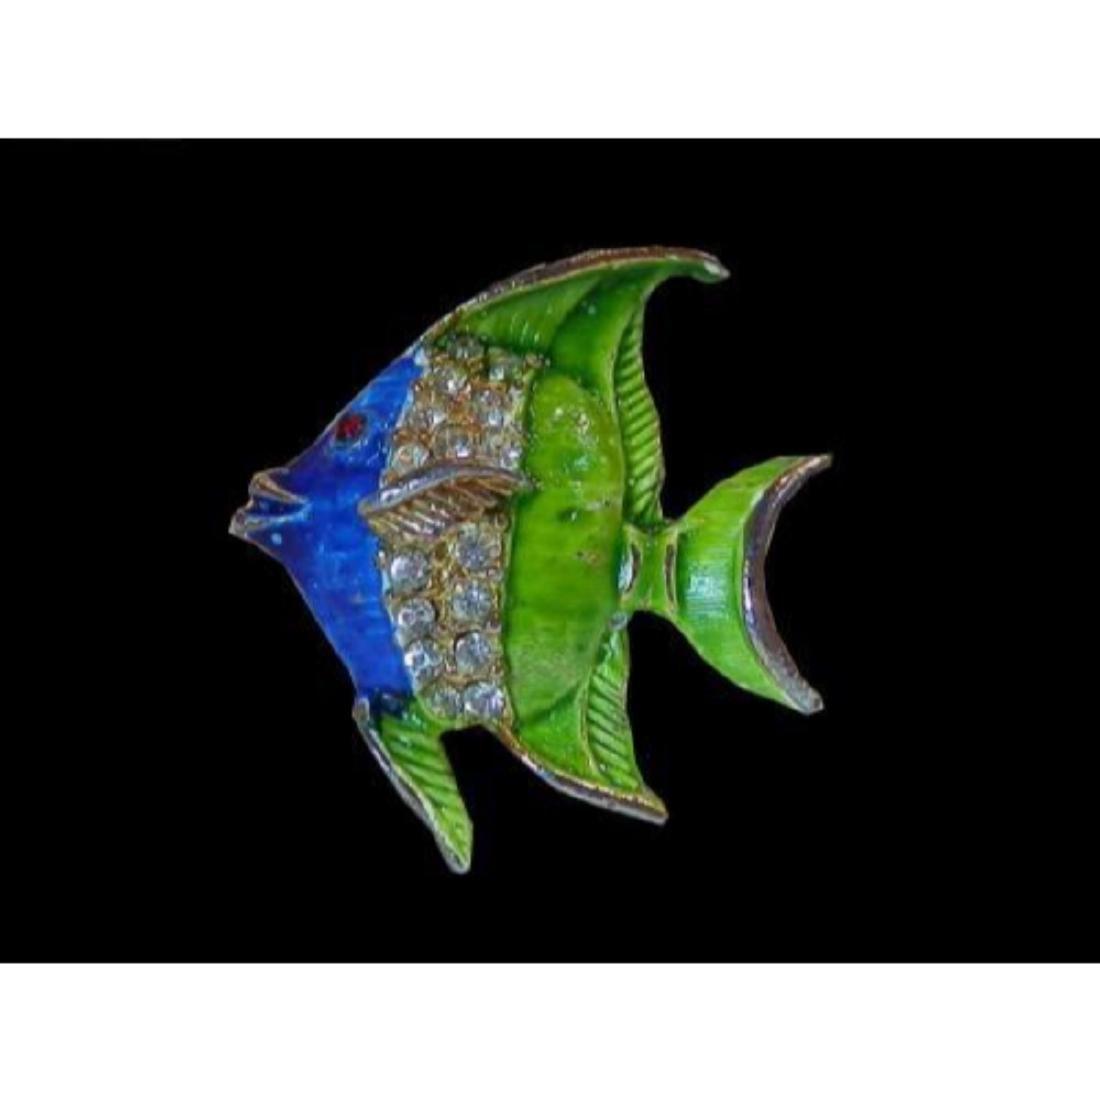 Vintage 1970's Blue & Green Enamel & Rhinestone Fish - 4